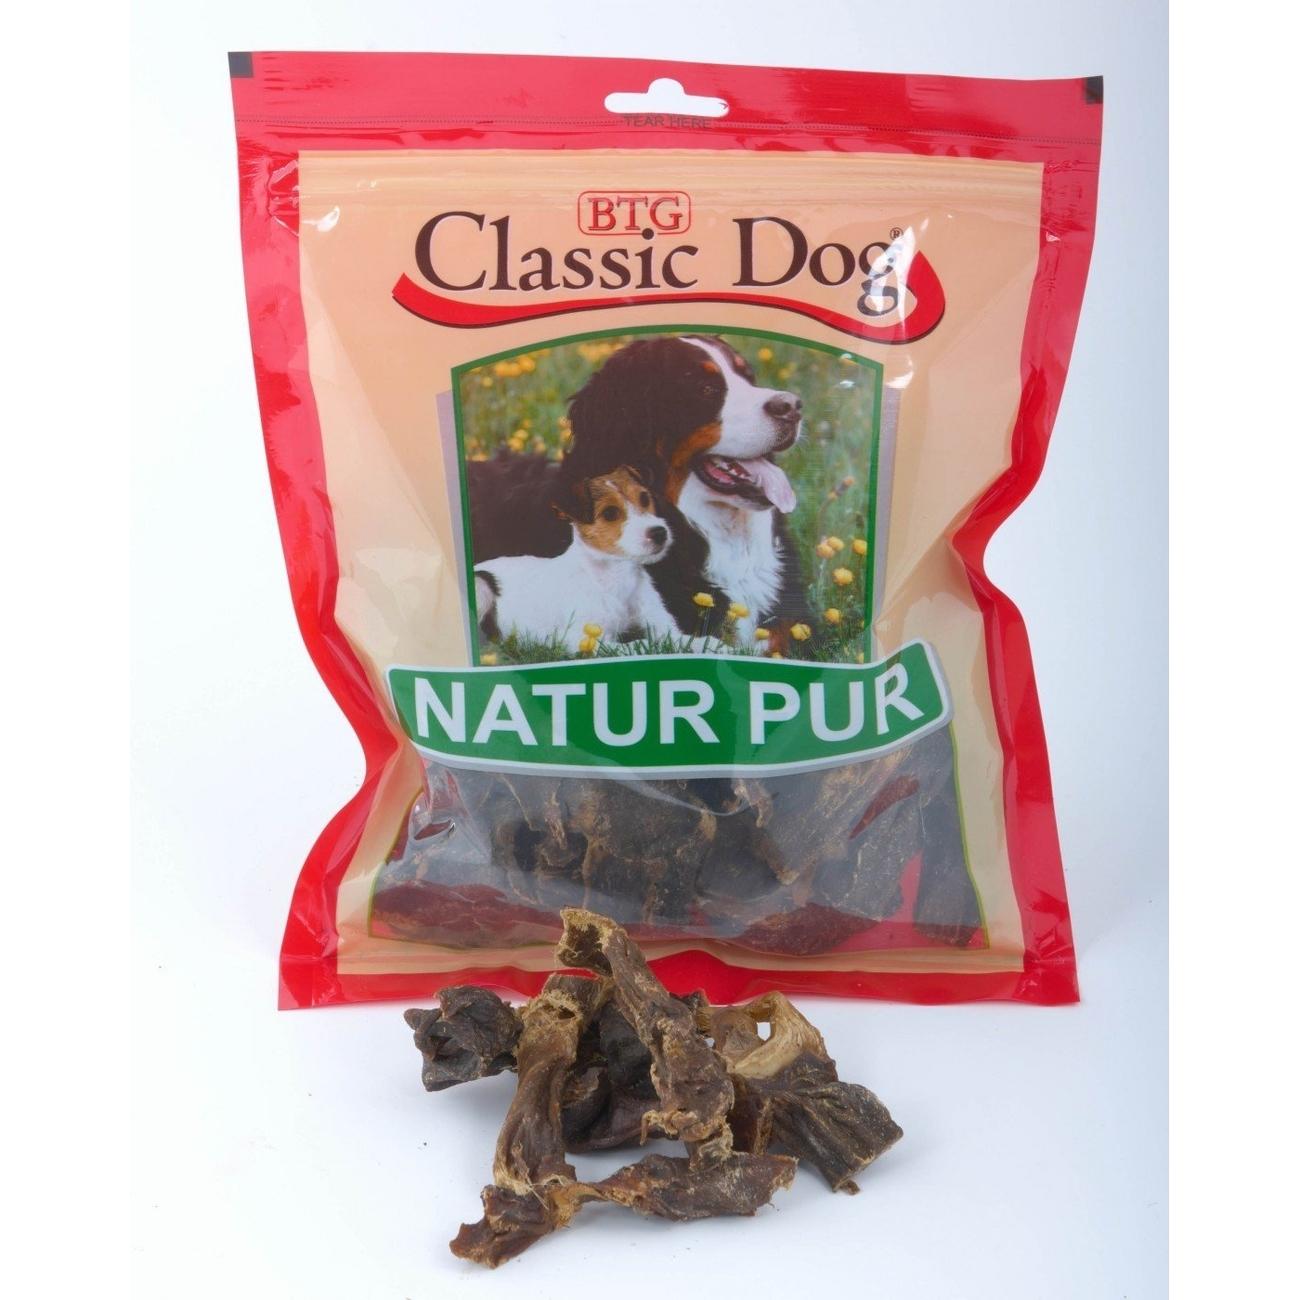 Classic Dog Rinderherzen Hunde Kauartikel, 100g